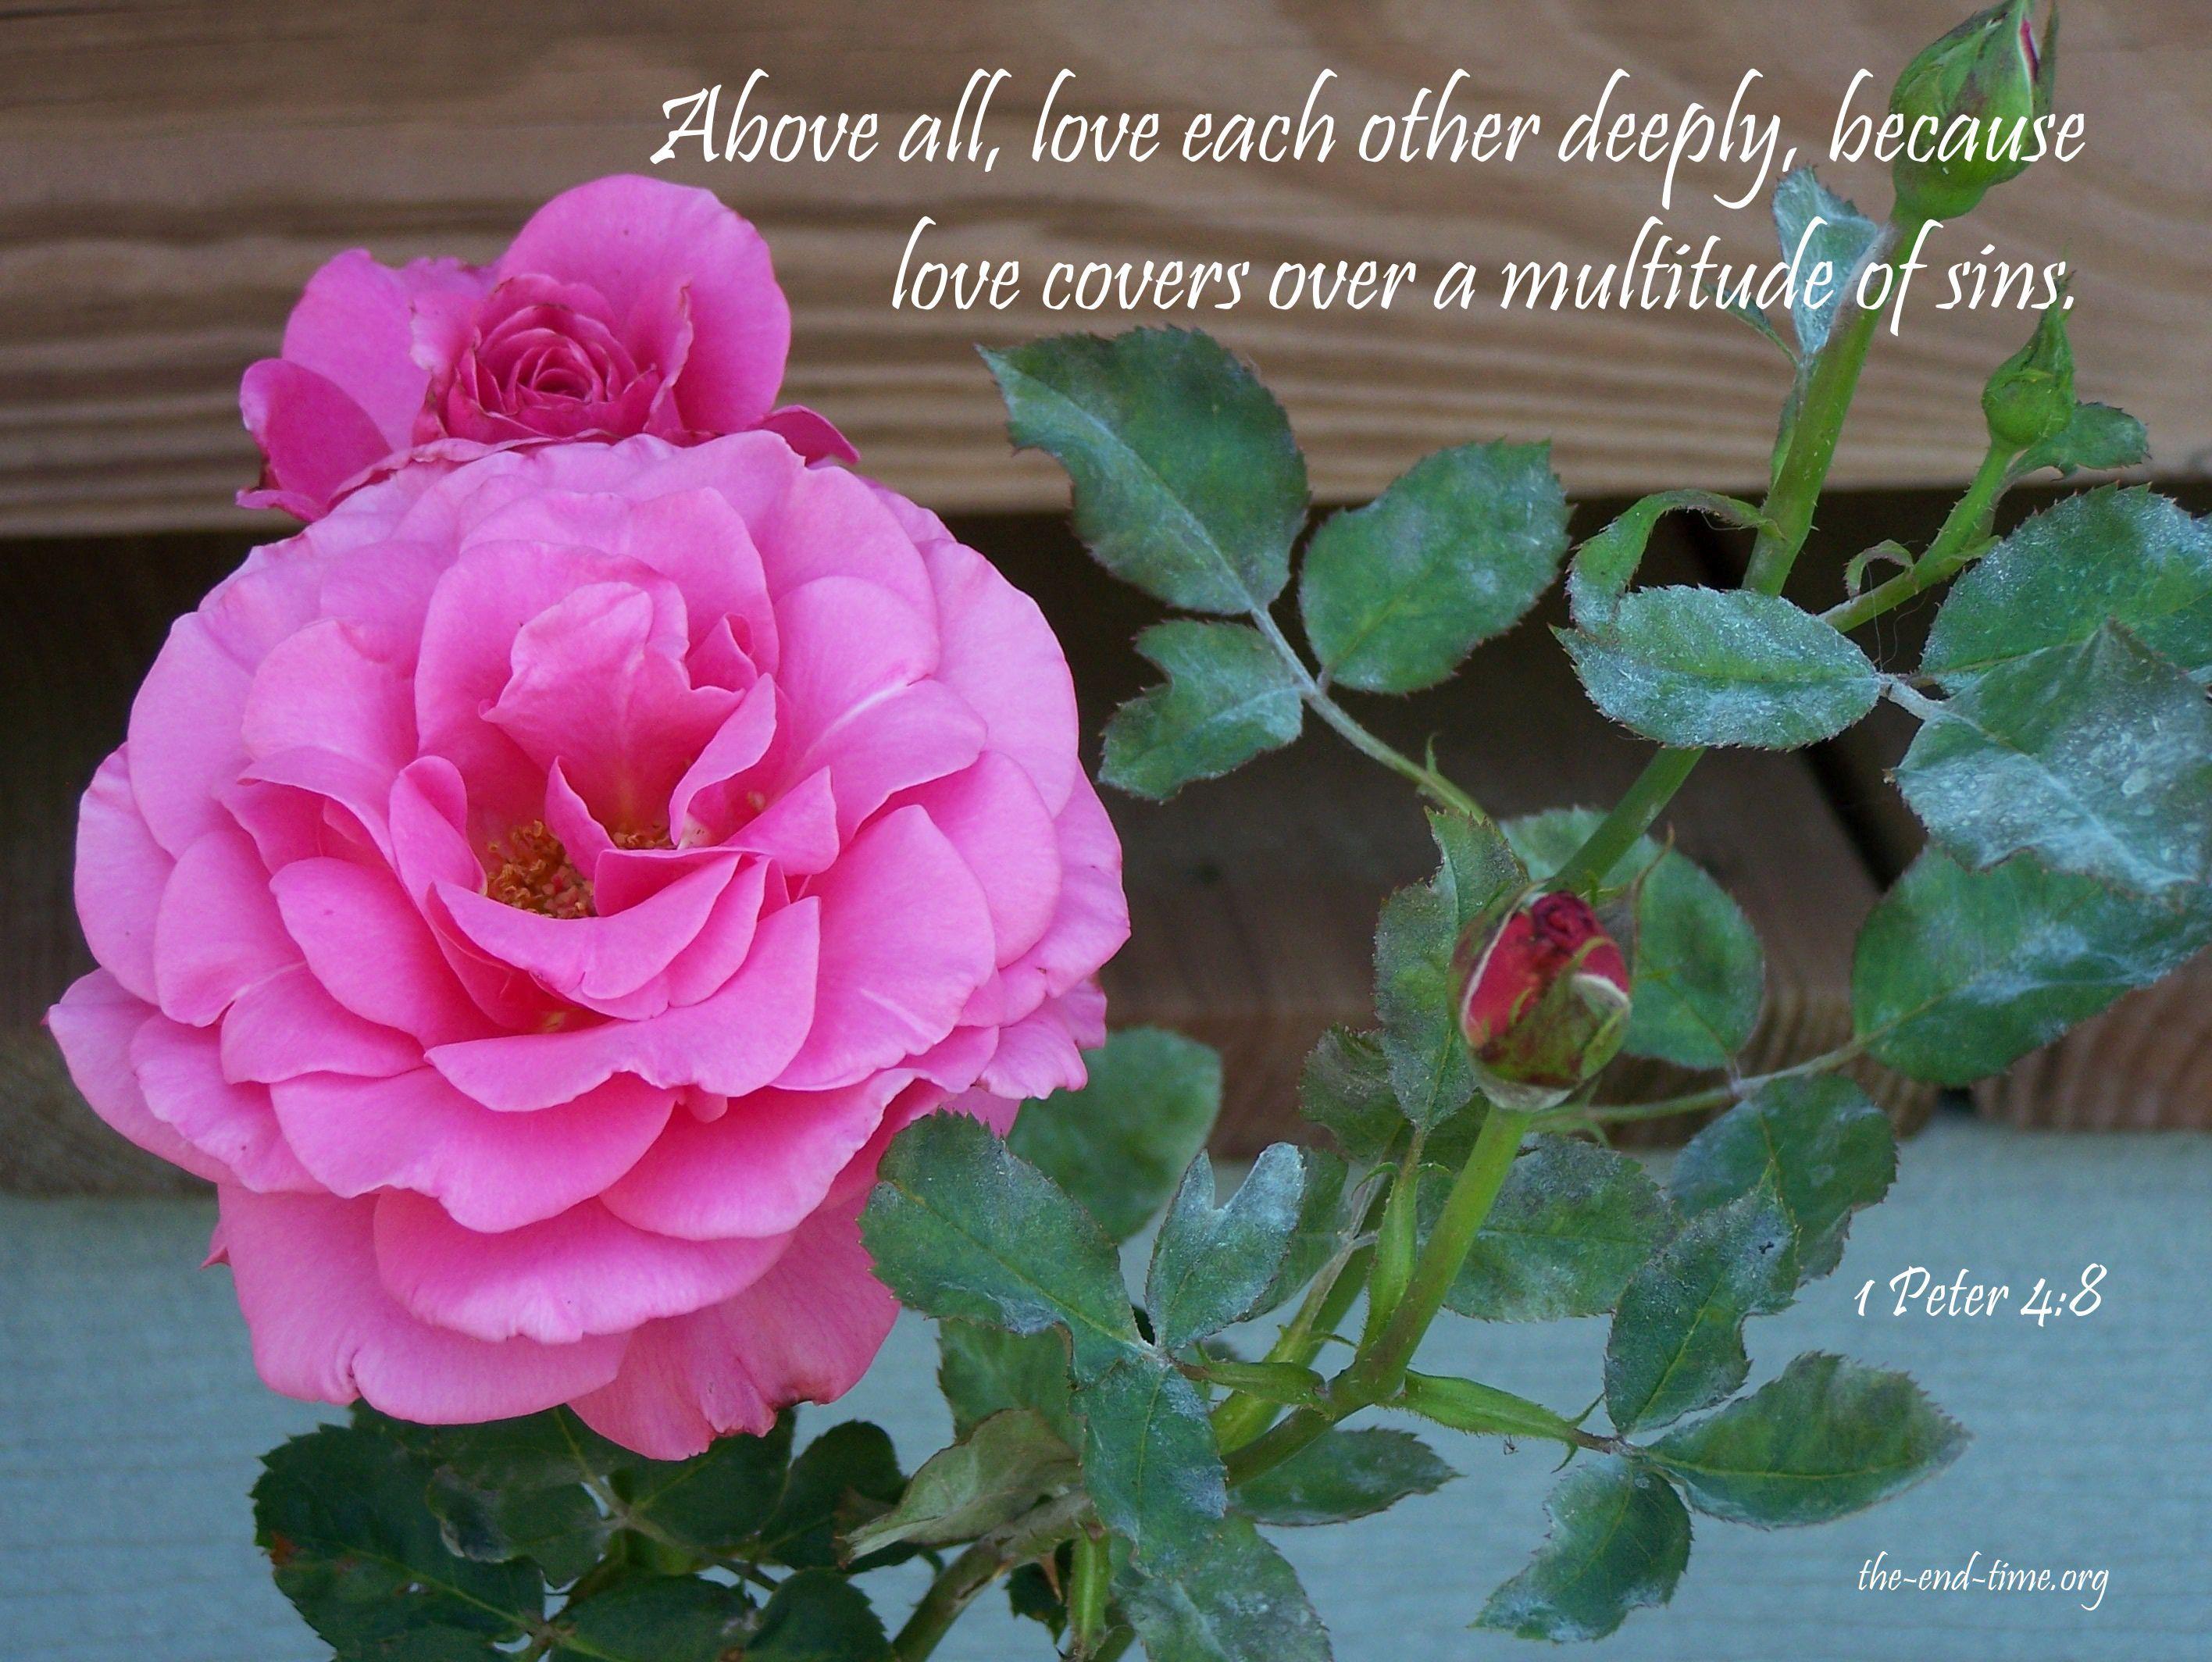 love verse 4